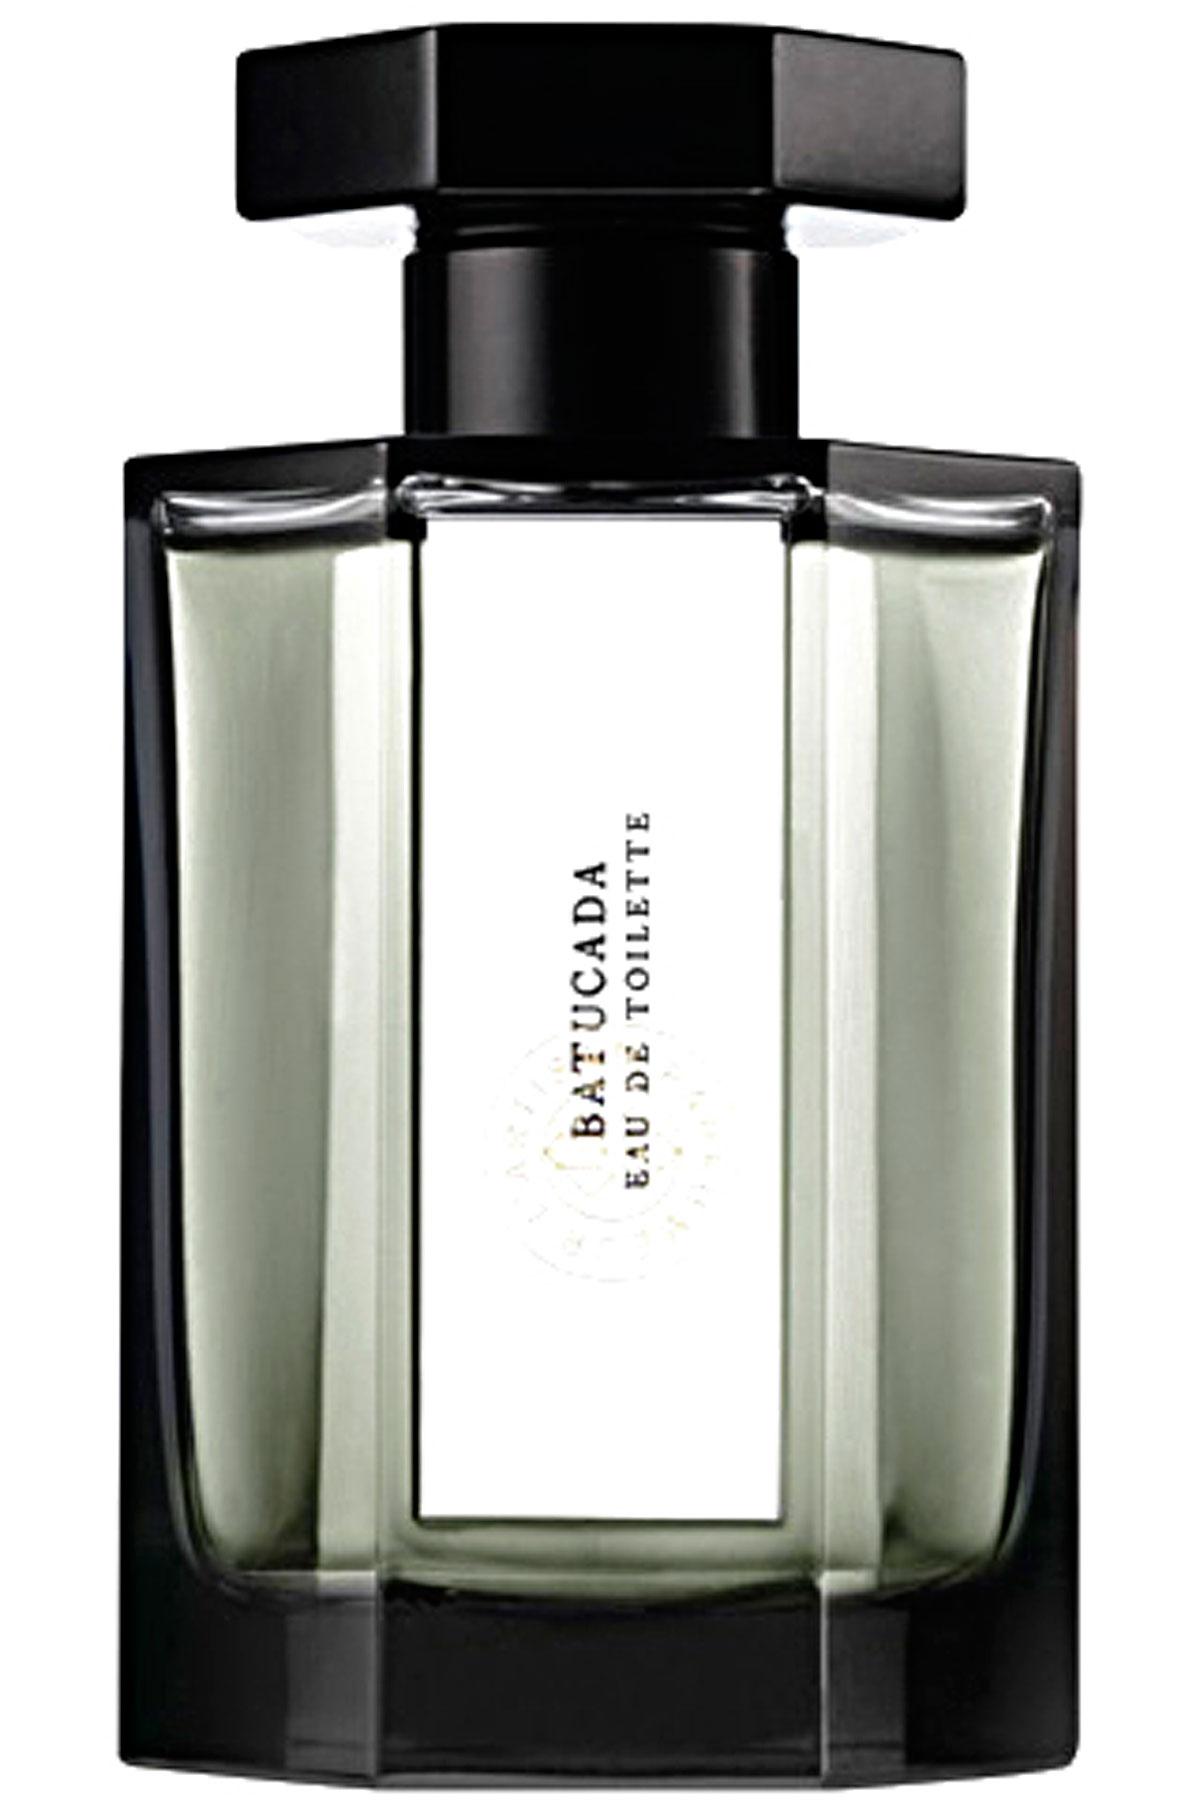 Artisan Parfumeur Fragrances for Women, Batucada - Eau De Toilette - 100 Ml, 2019, 100 ml